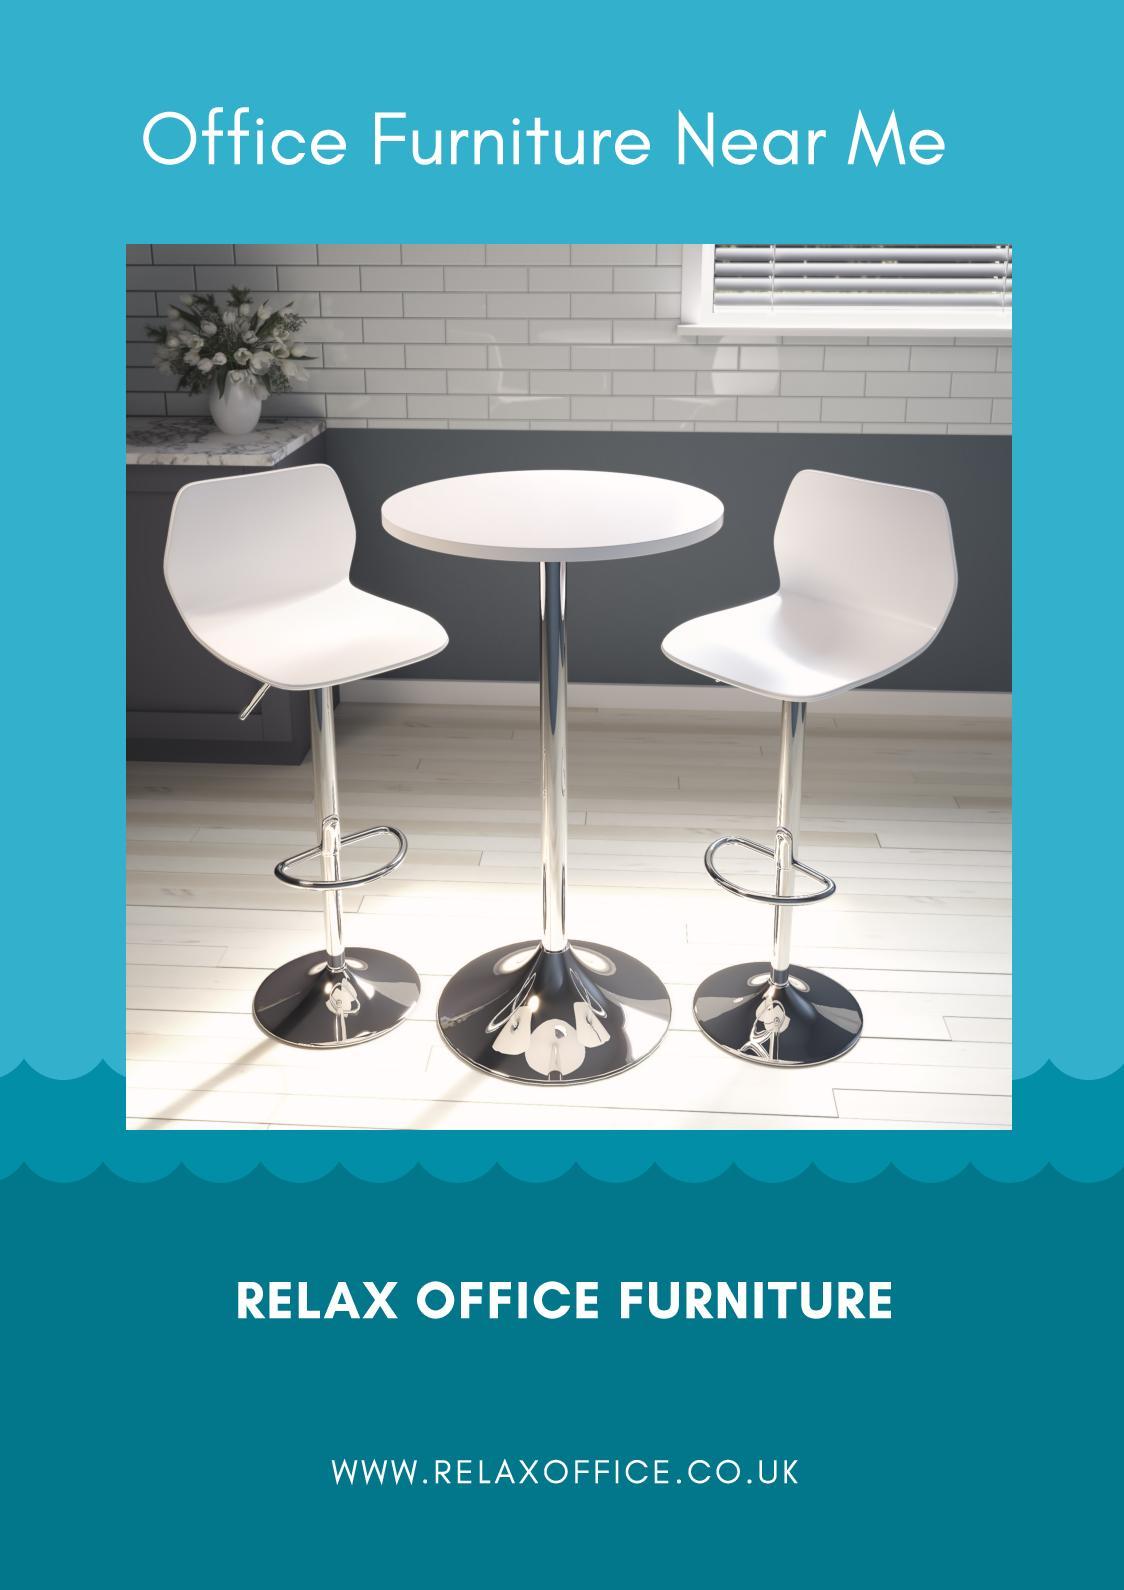 Calameo Where Can I Buy Office Furniture Near Me